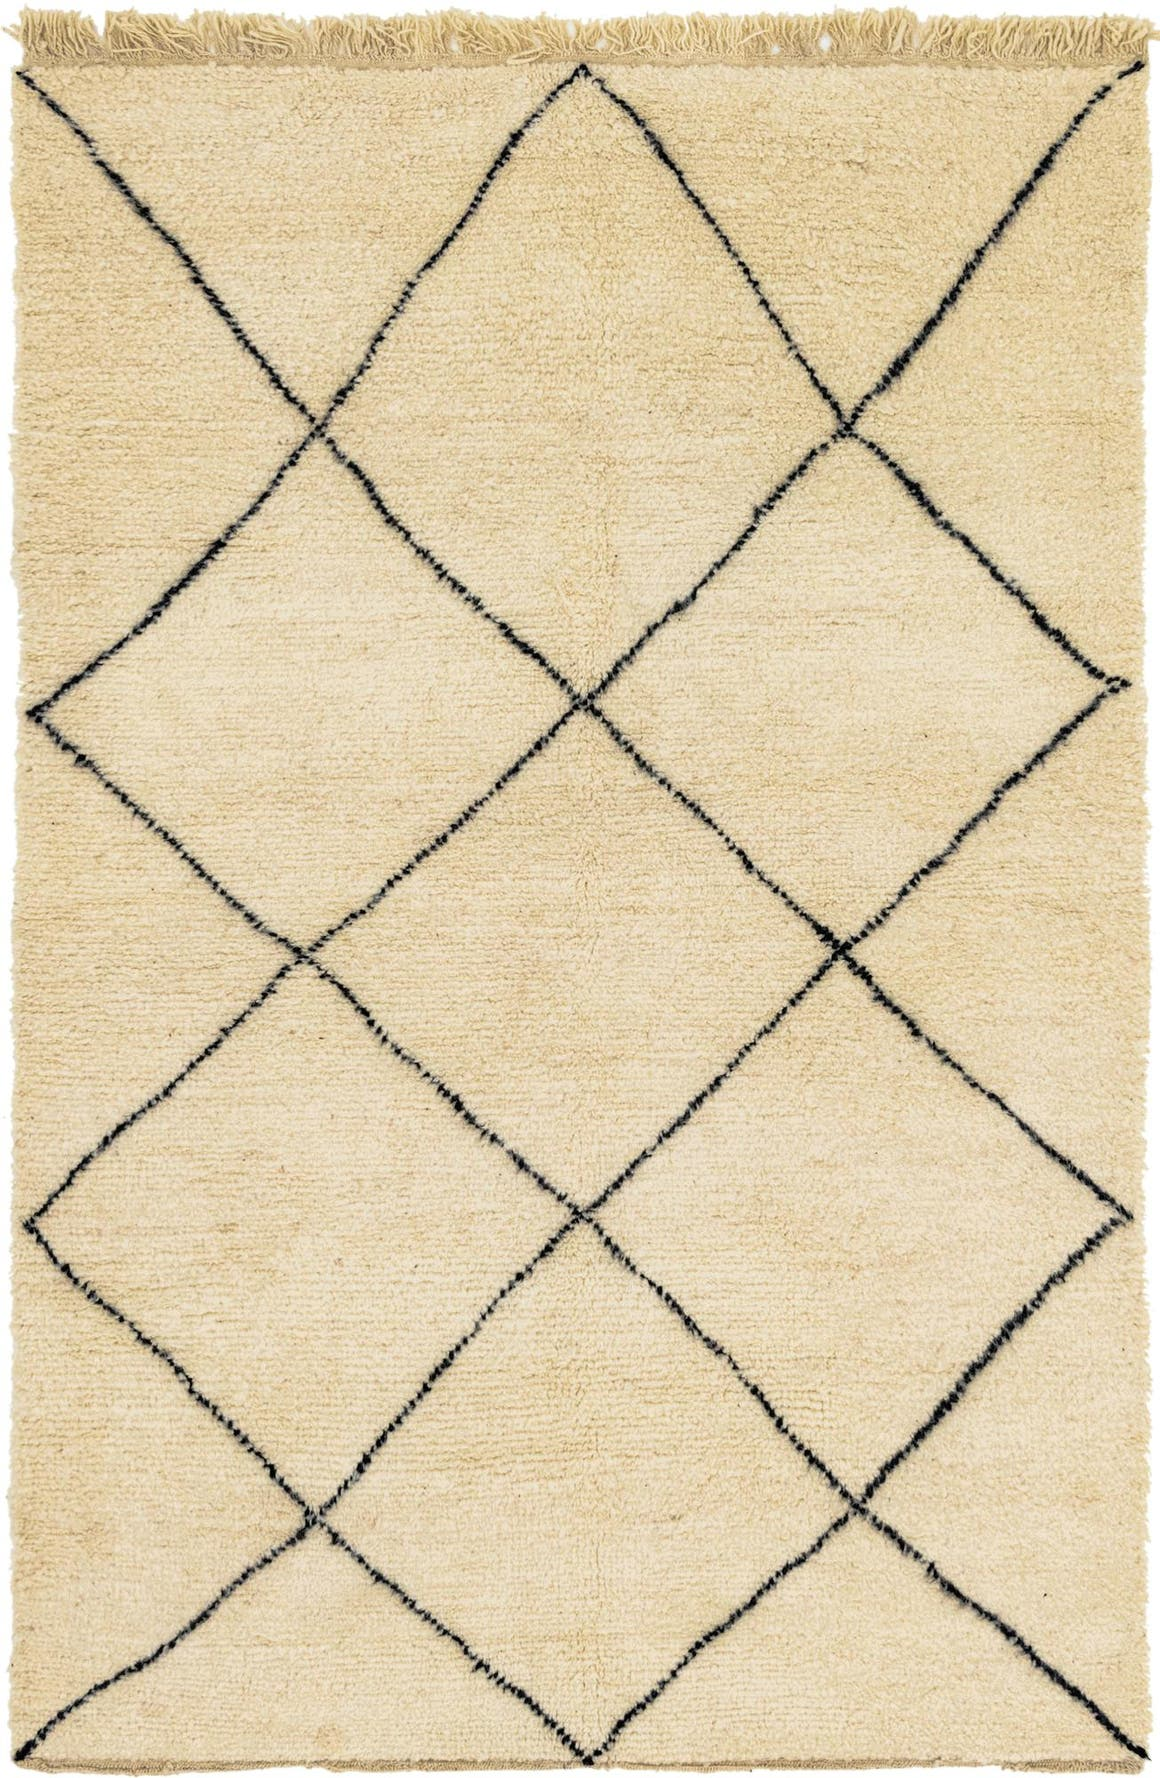 5' 5 x 7' 9 Moroccan Rug main image